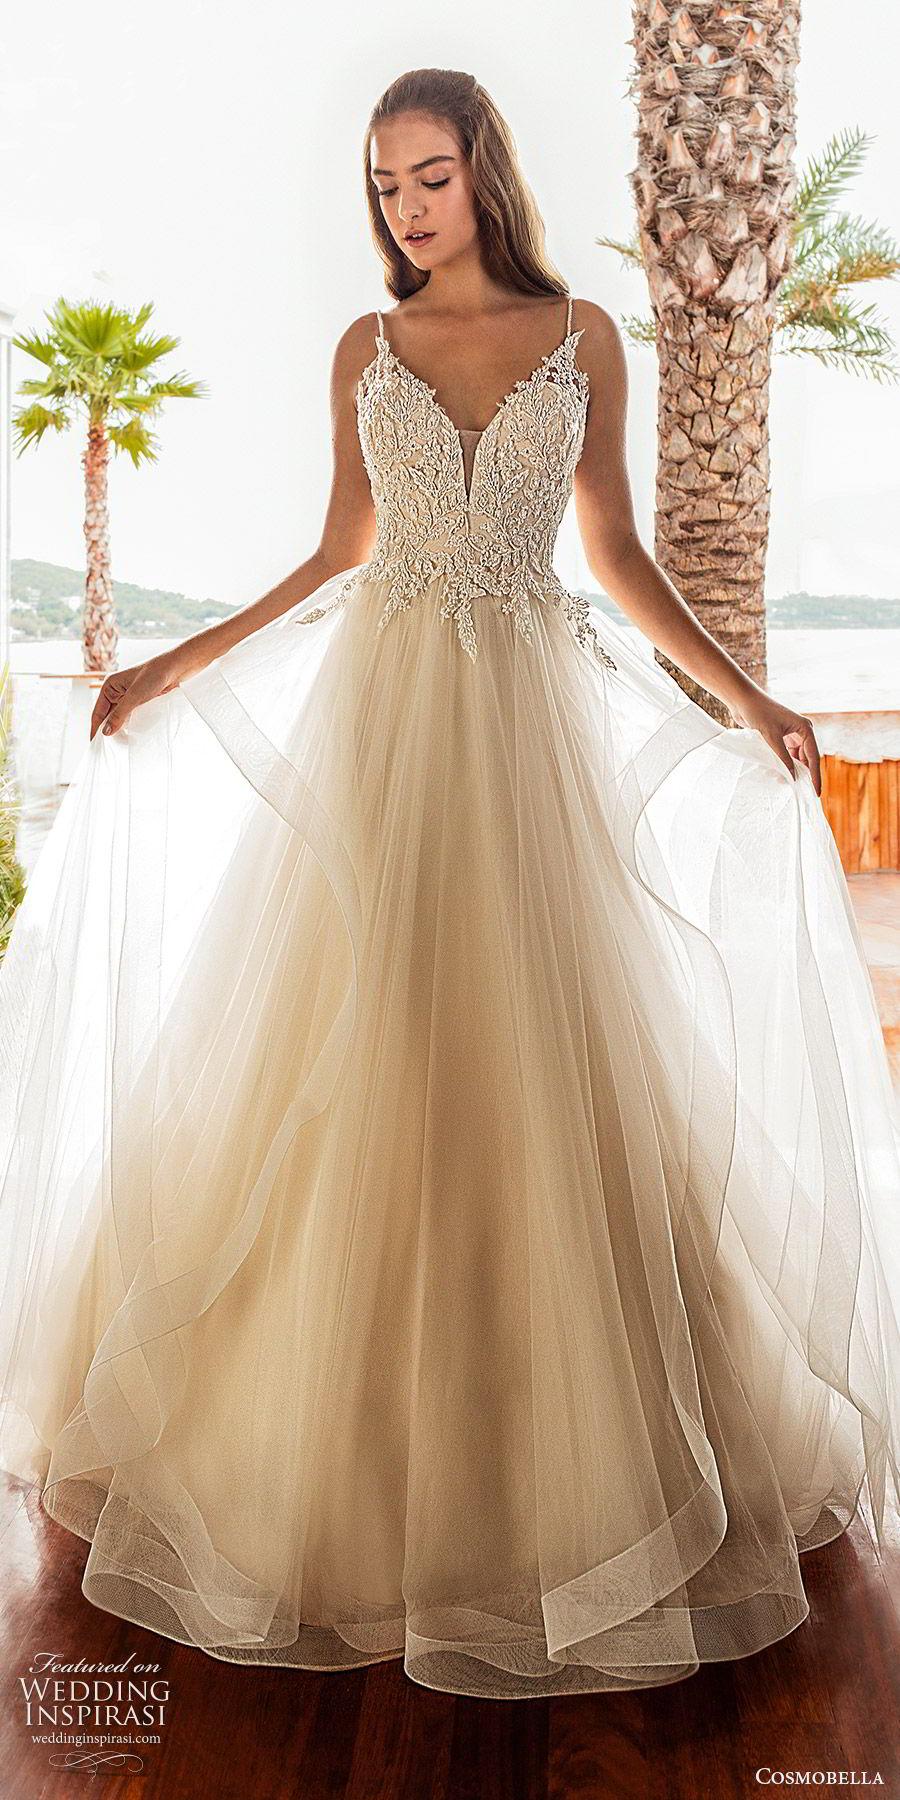 cosmobella 2020 bridal sleeveless thin straps embellished bodice a line ball gown wedding dress (14) romantic princess tiered skirt chepel train mv